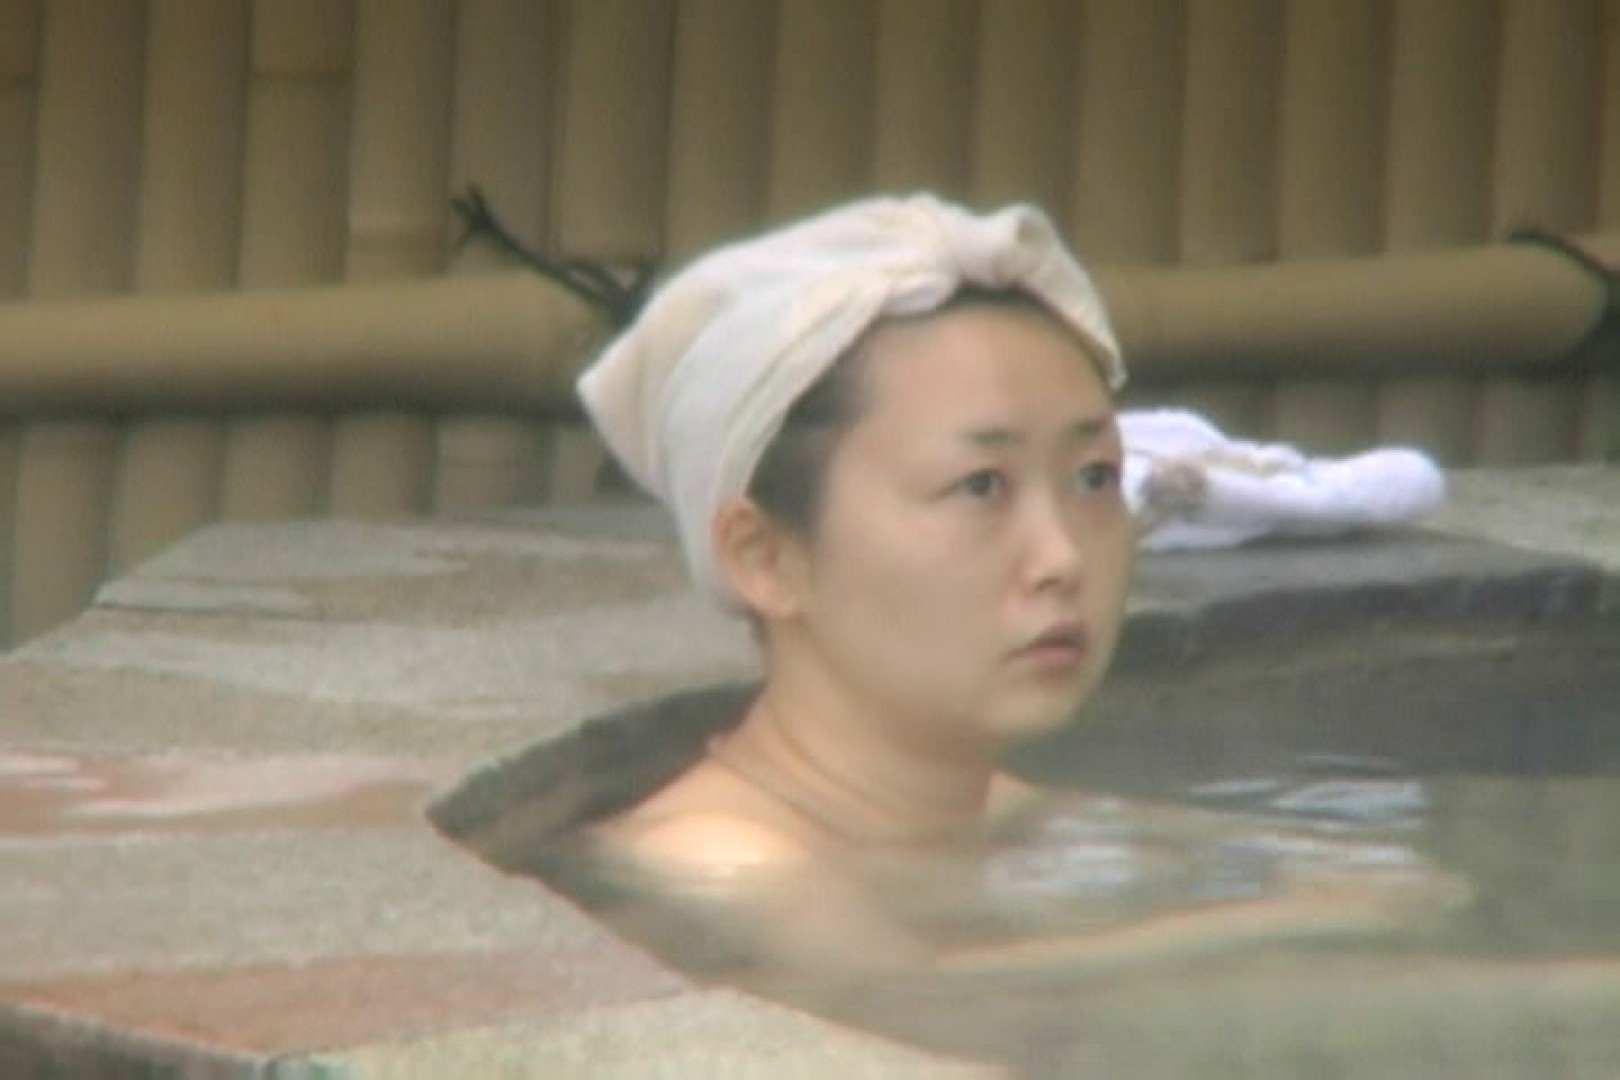 Aquaな露天風呂Vol.564 OL  87連発 30